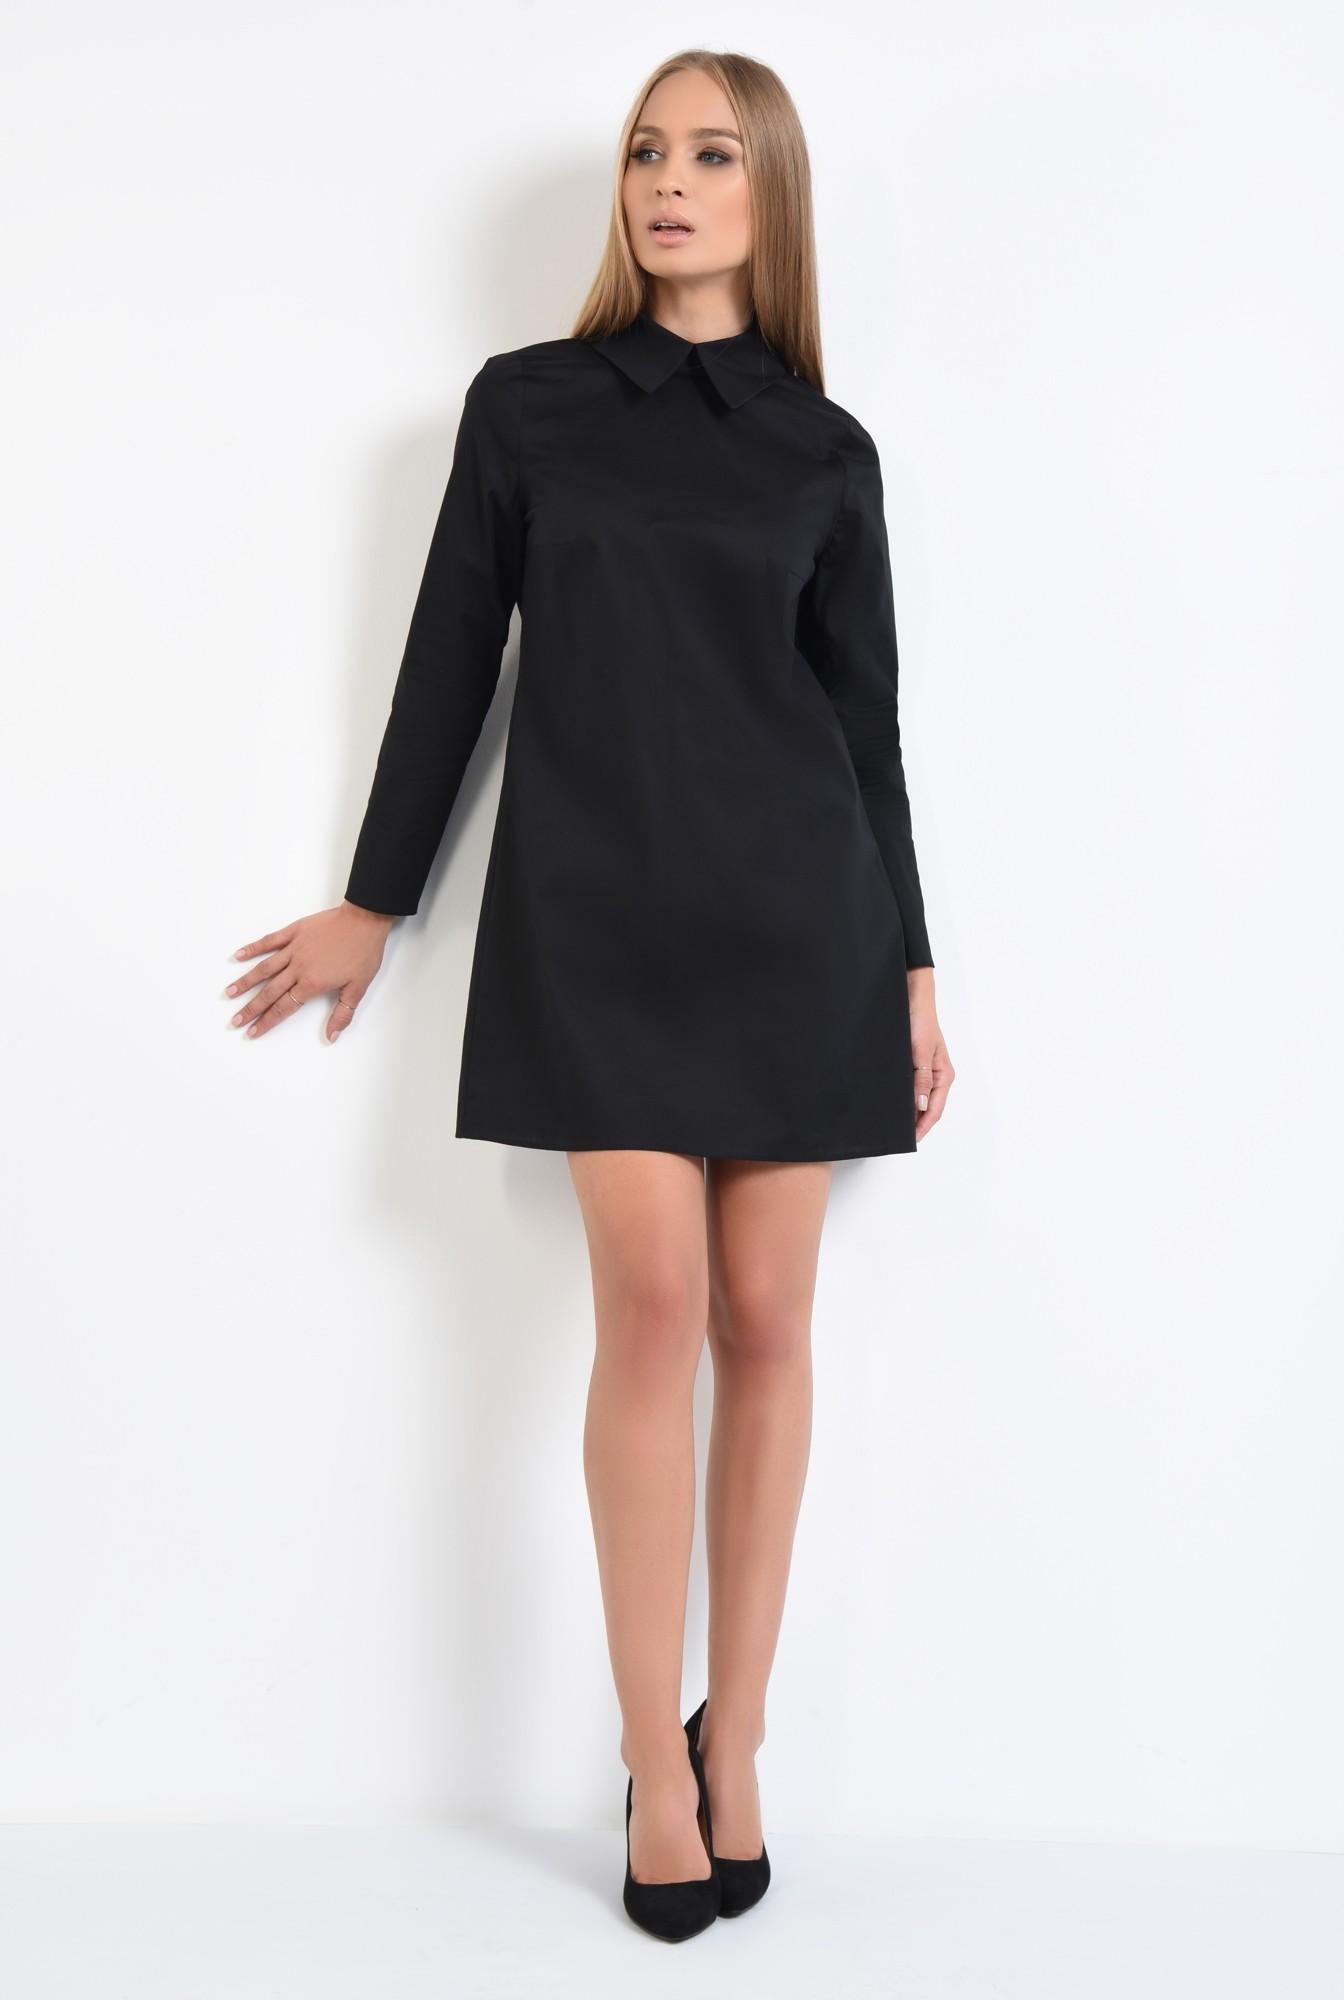 3 - rochie casual, stil camasa, guler ascutit, rochii online